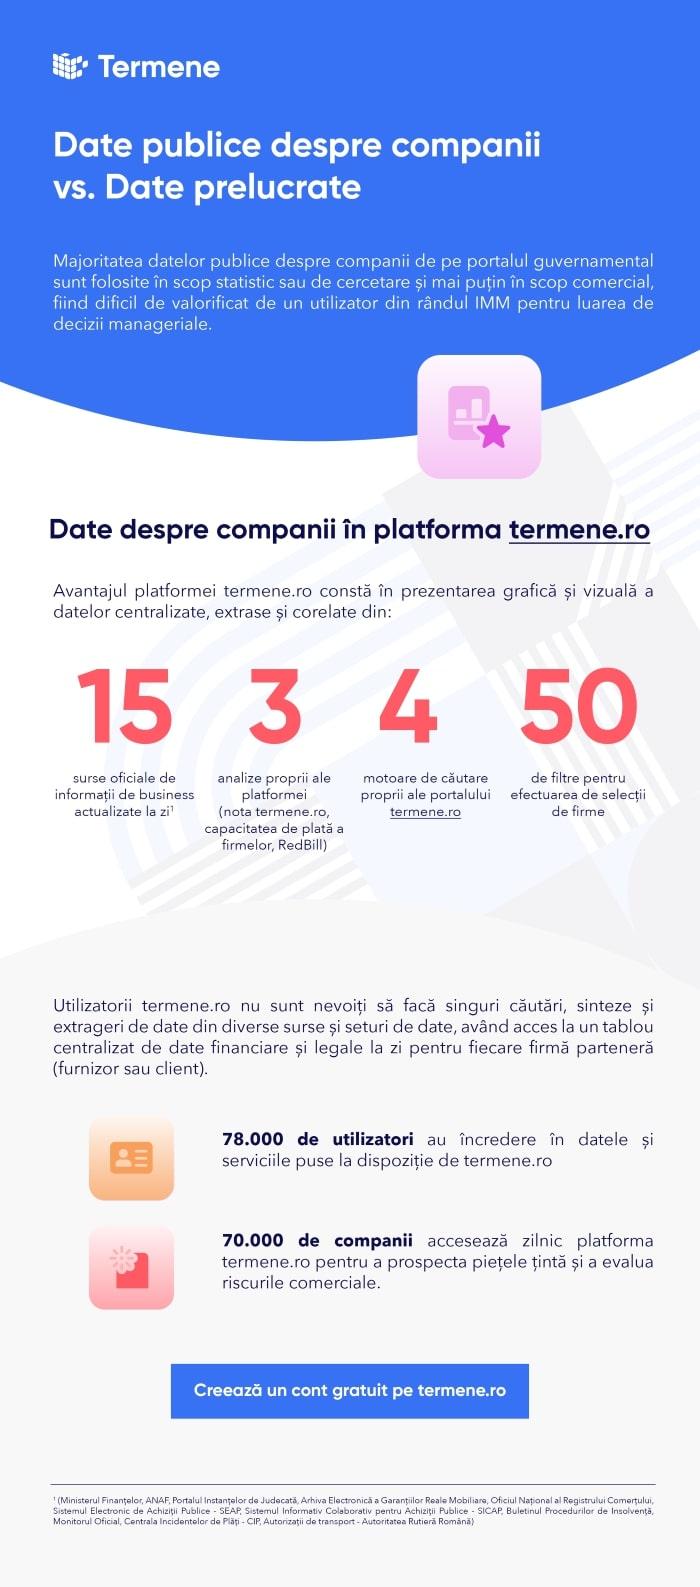 Date publice vs date prelucrate pe termene.ro